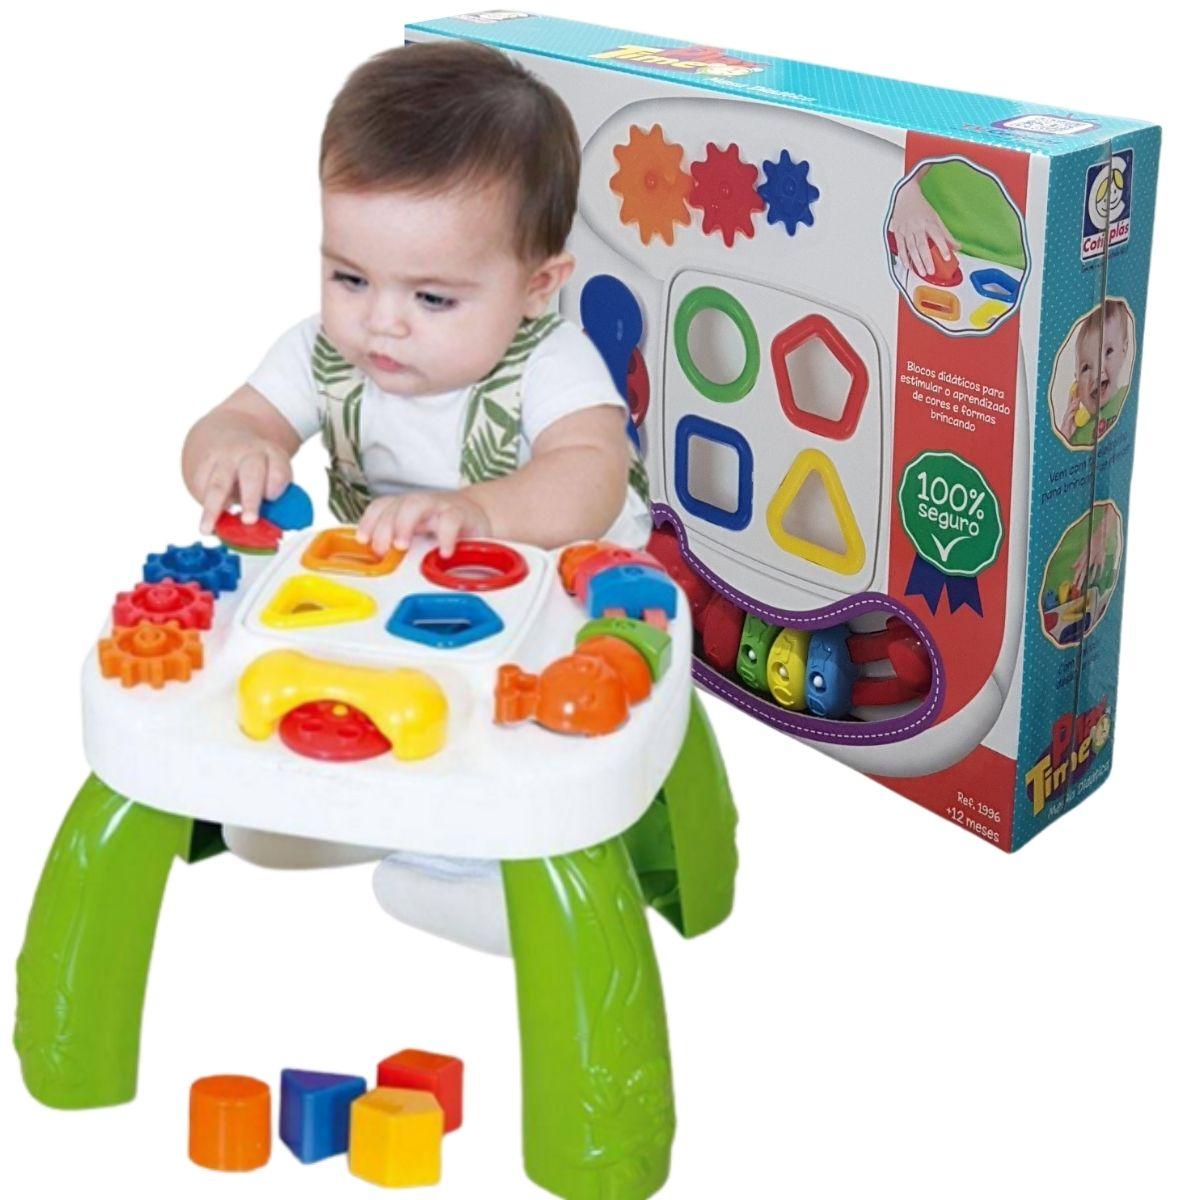 Mesa Didática Infantil Mesinha Educativa Colorida Cotiplás